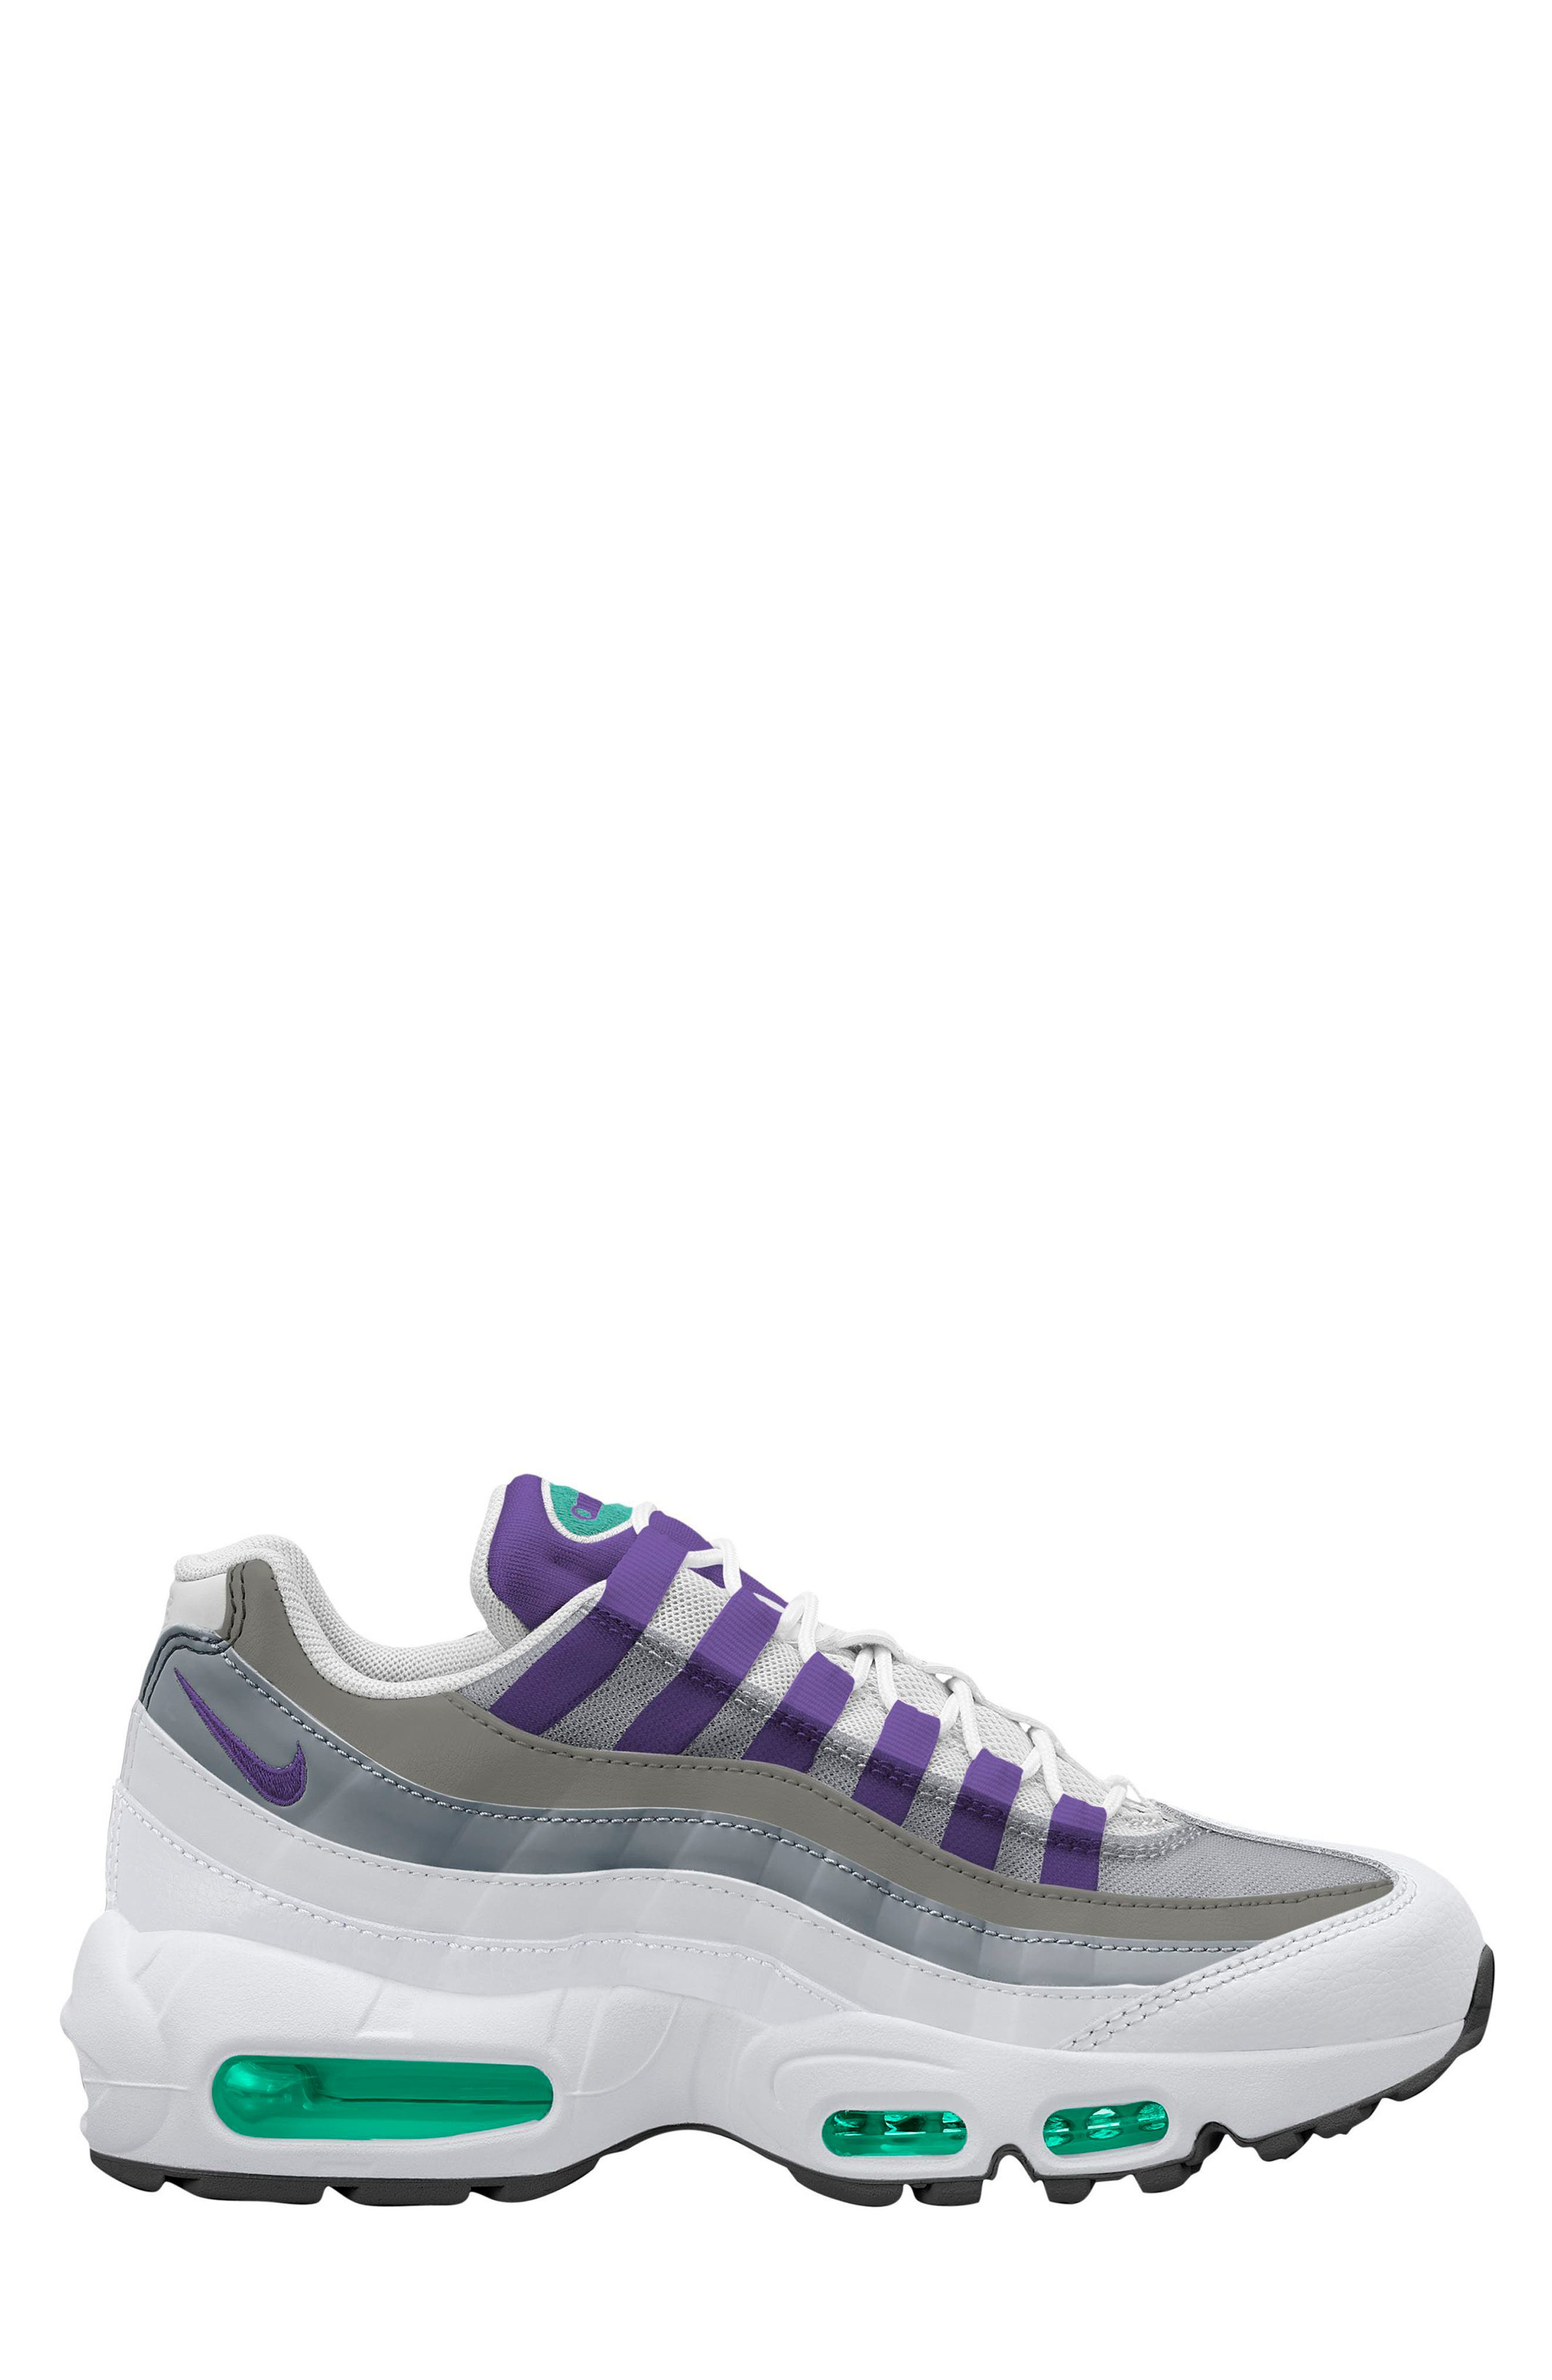 Best Well Dressed Air Jordan 5 Grey Purple Pink Green sm3ez4rjv